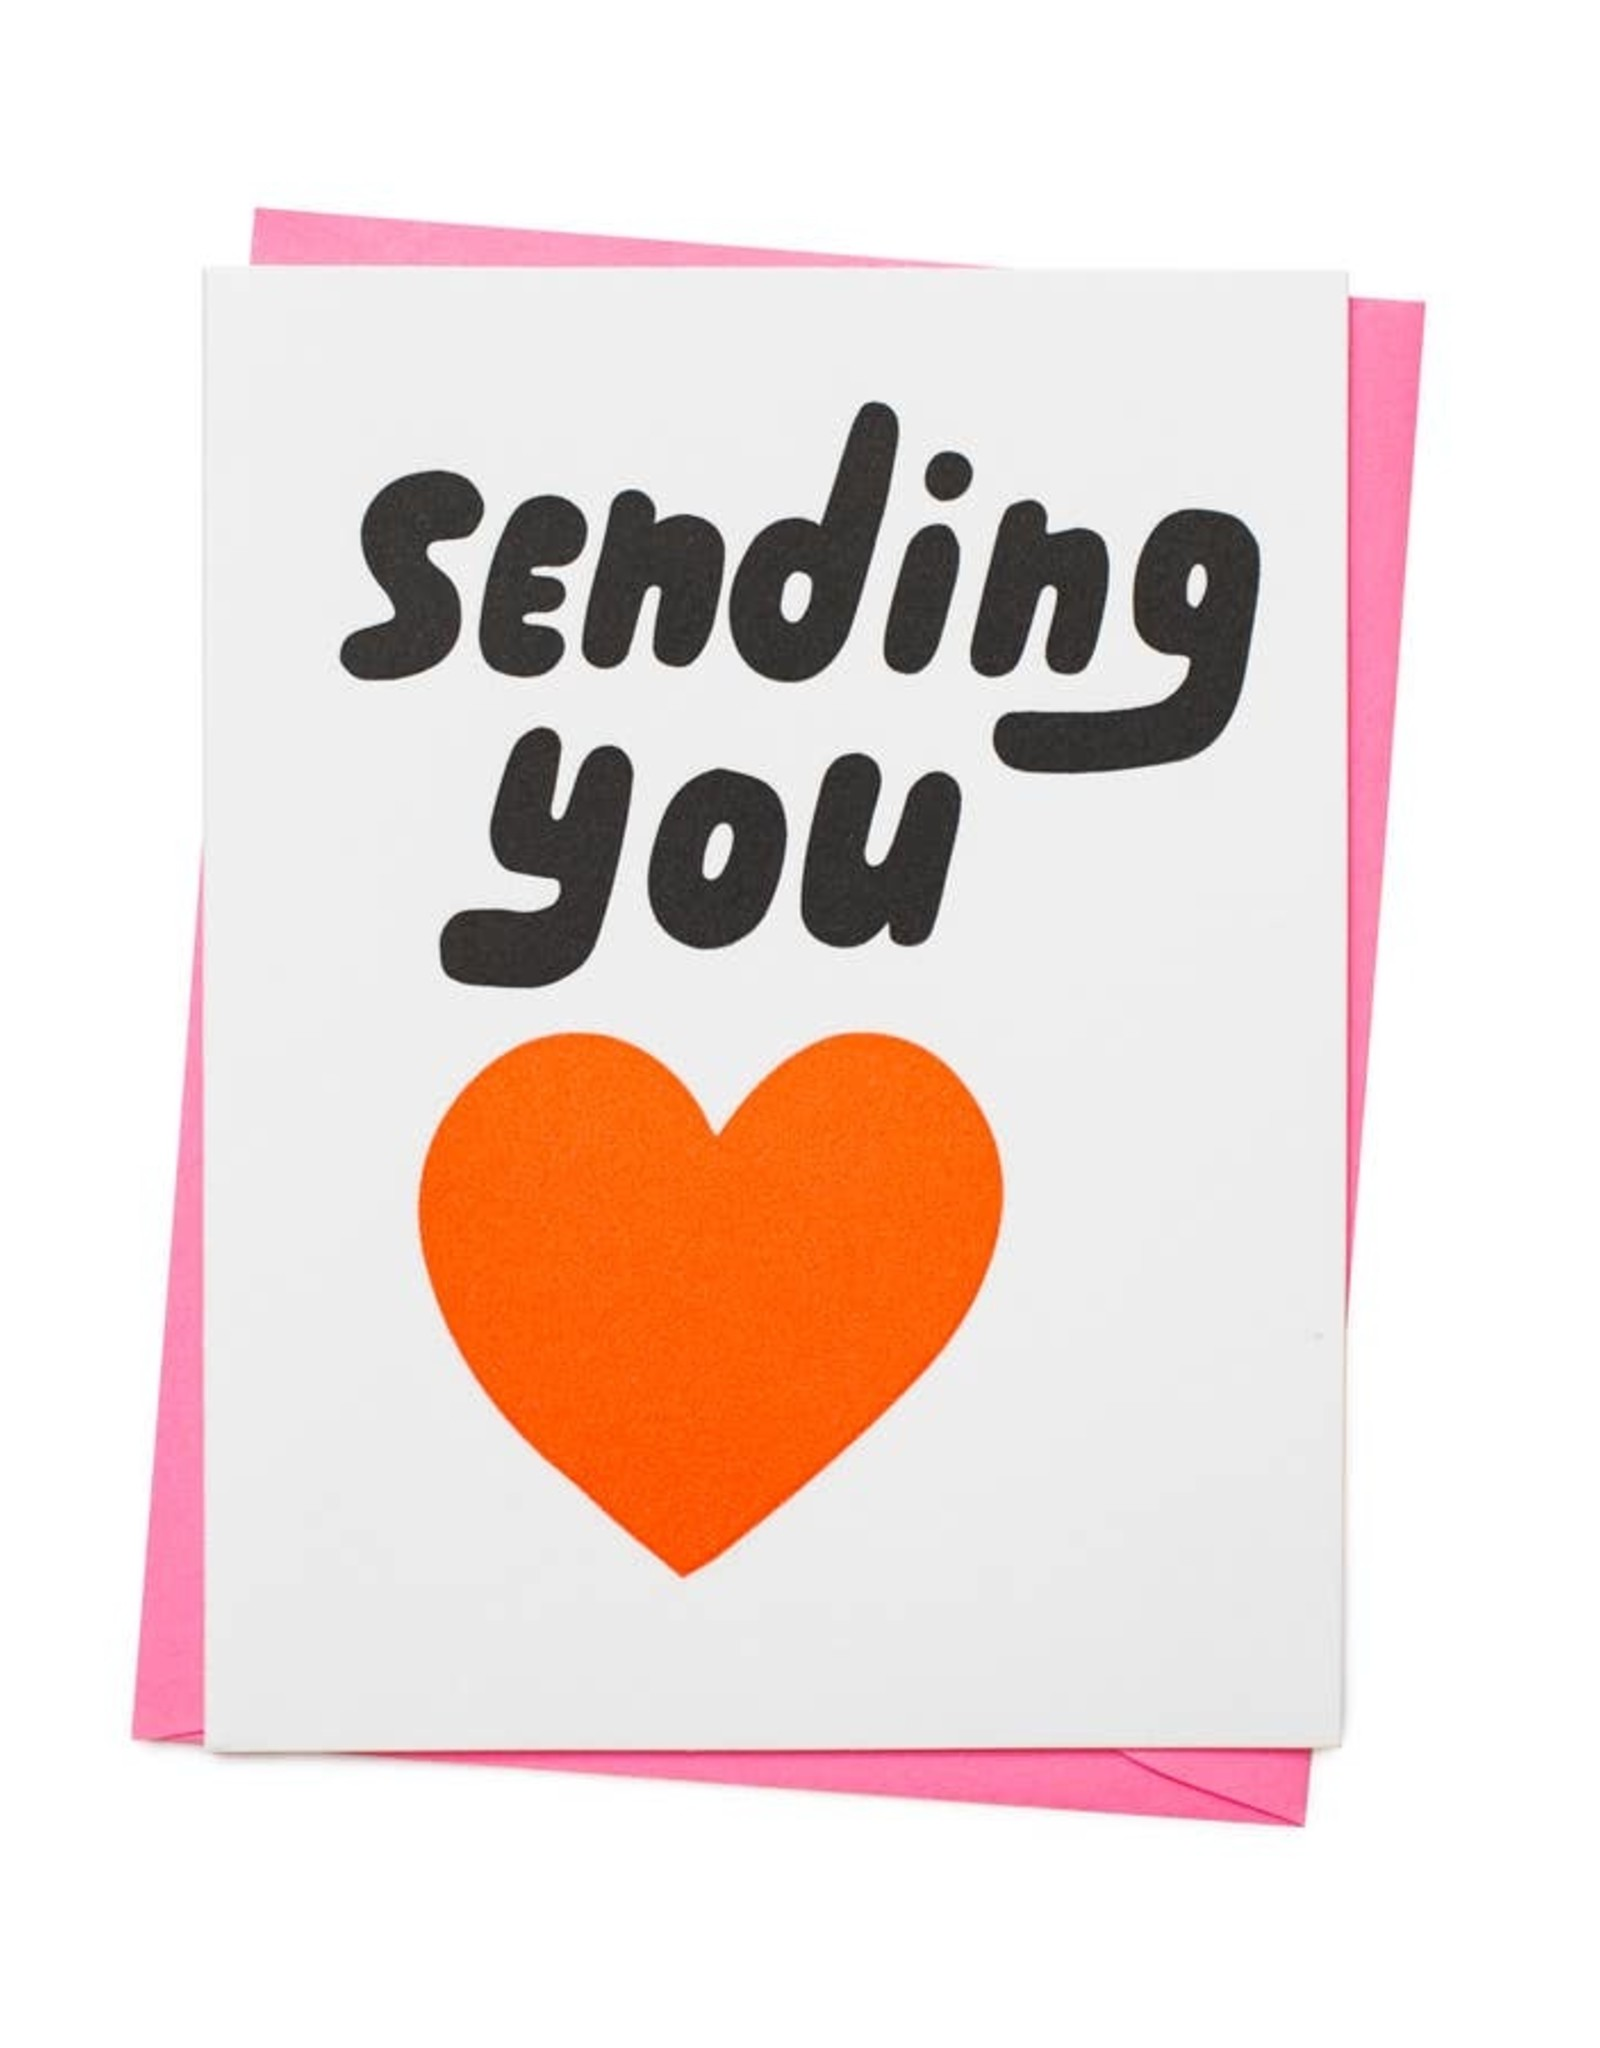 Ashkahn Ashkahn | Sending You